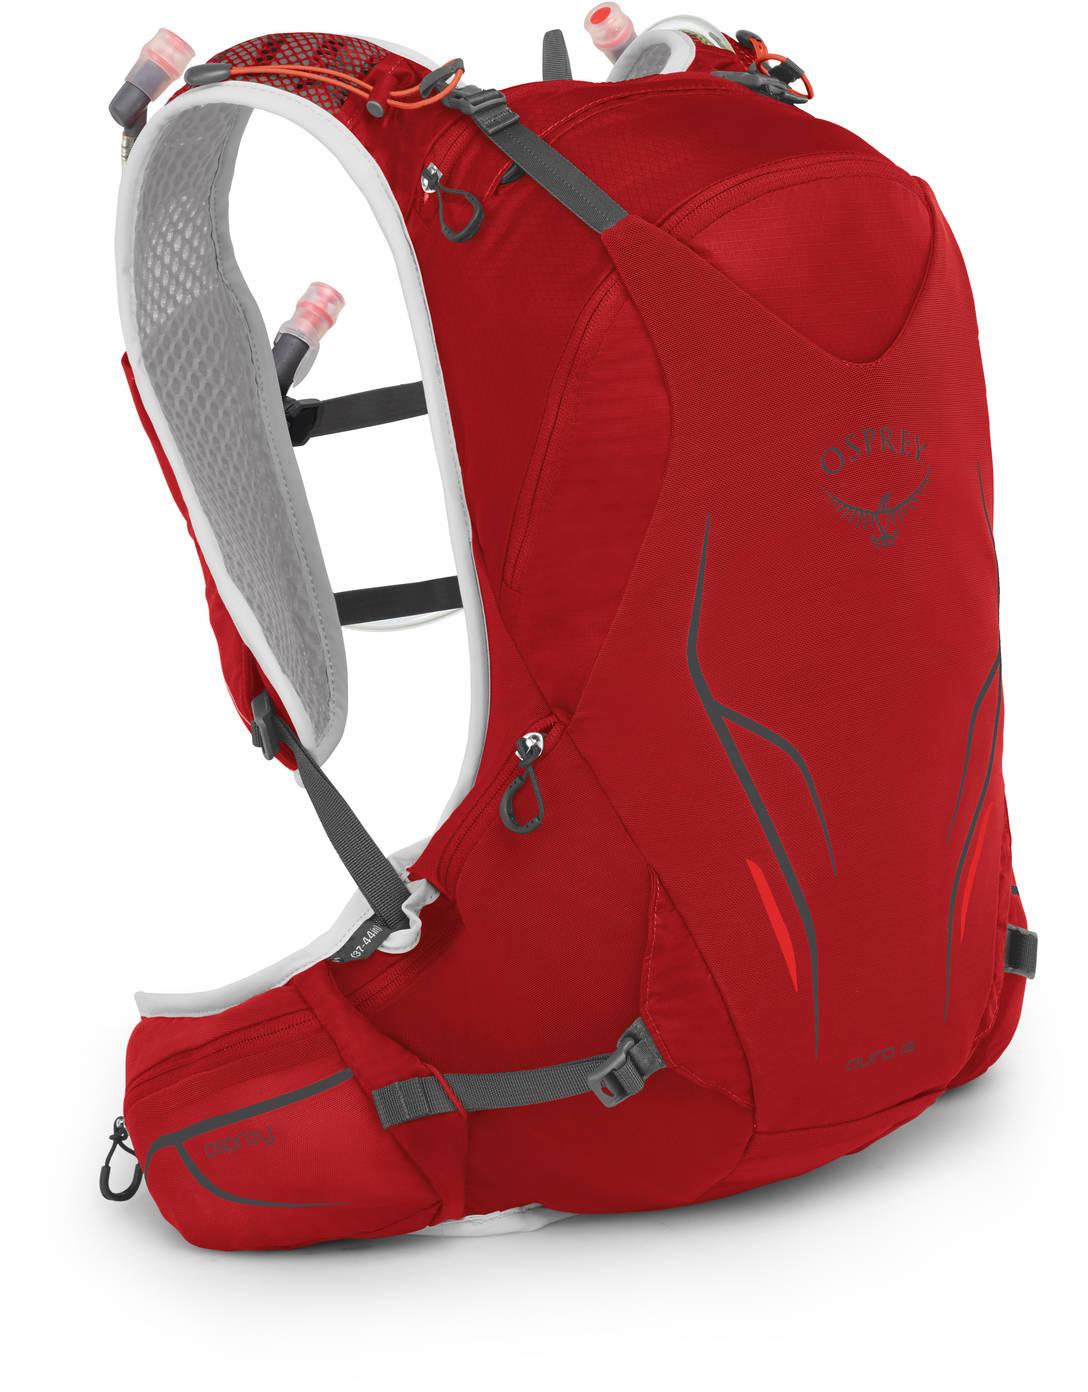 Рюкзаки для бега Рюкзак для бега Osprey Duro 15 Phoenix Red Duro_15_S19_Side_Phoenix_Red_web.jpg